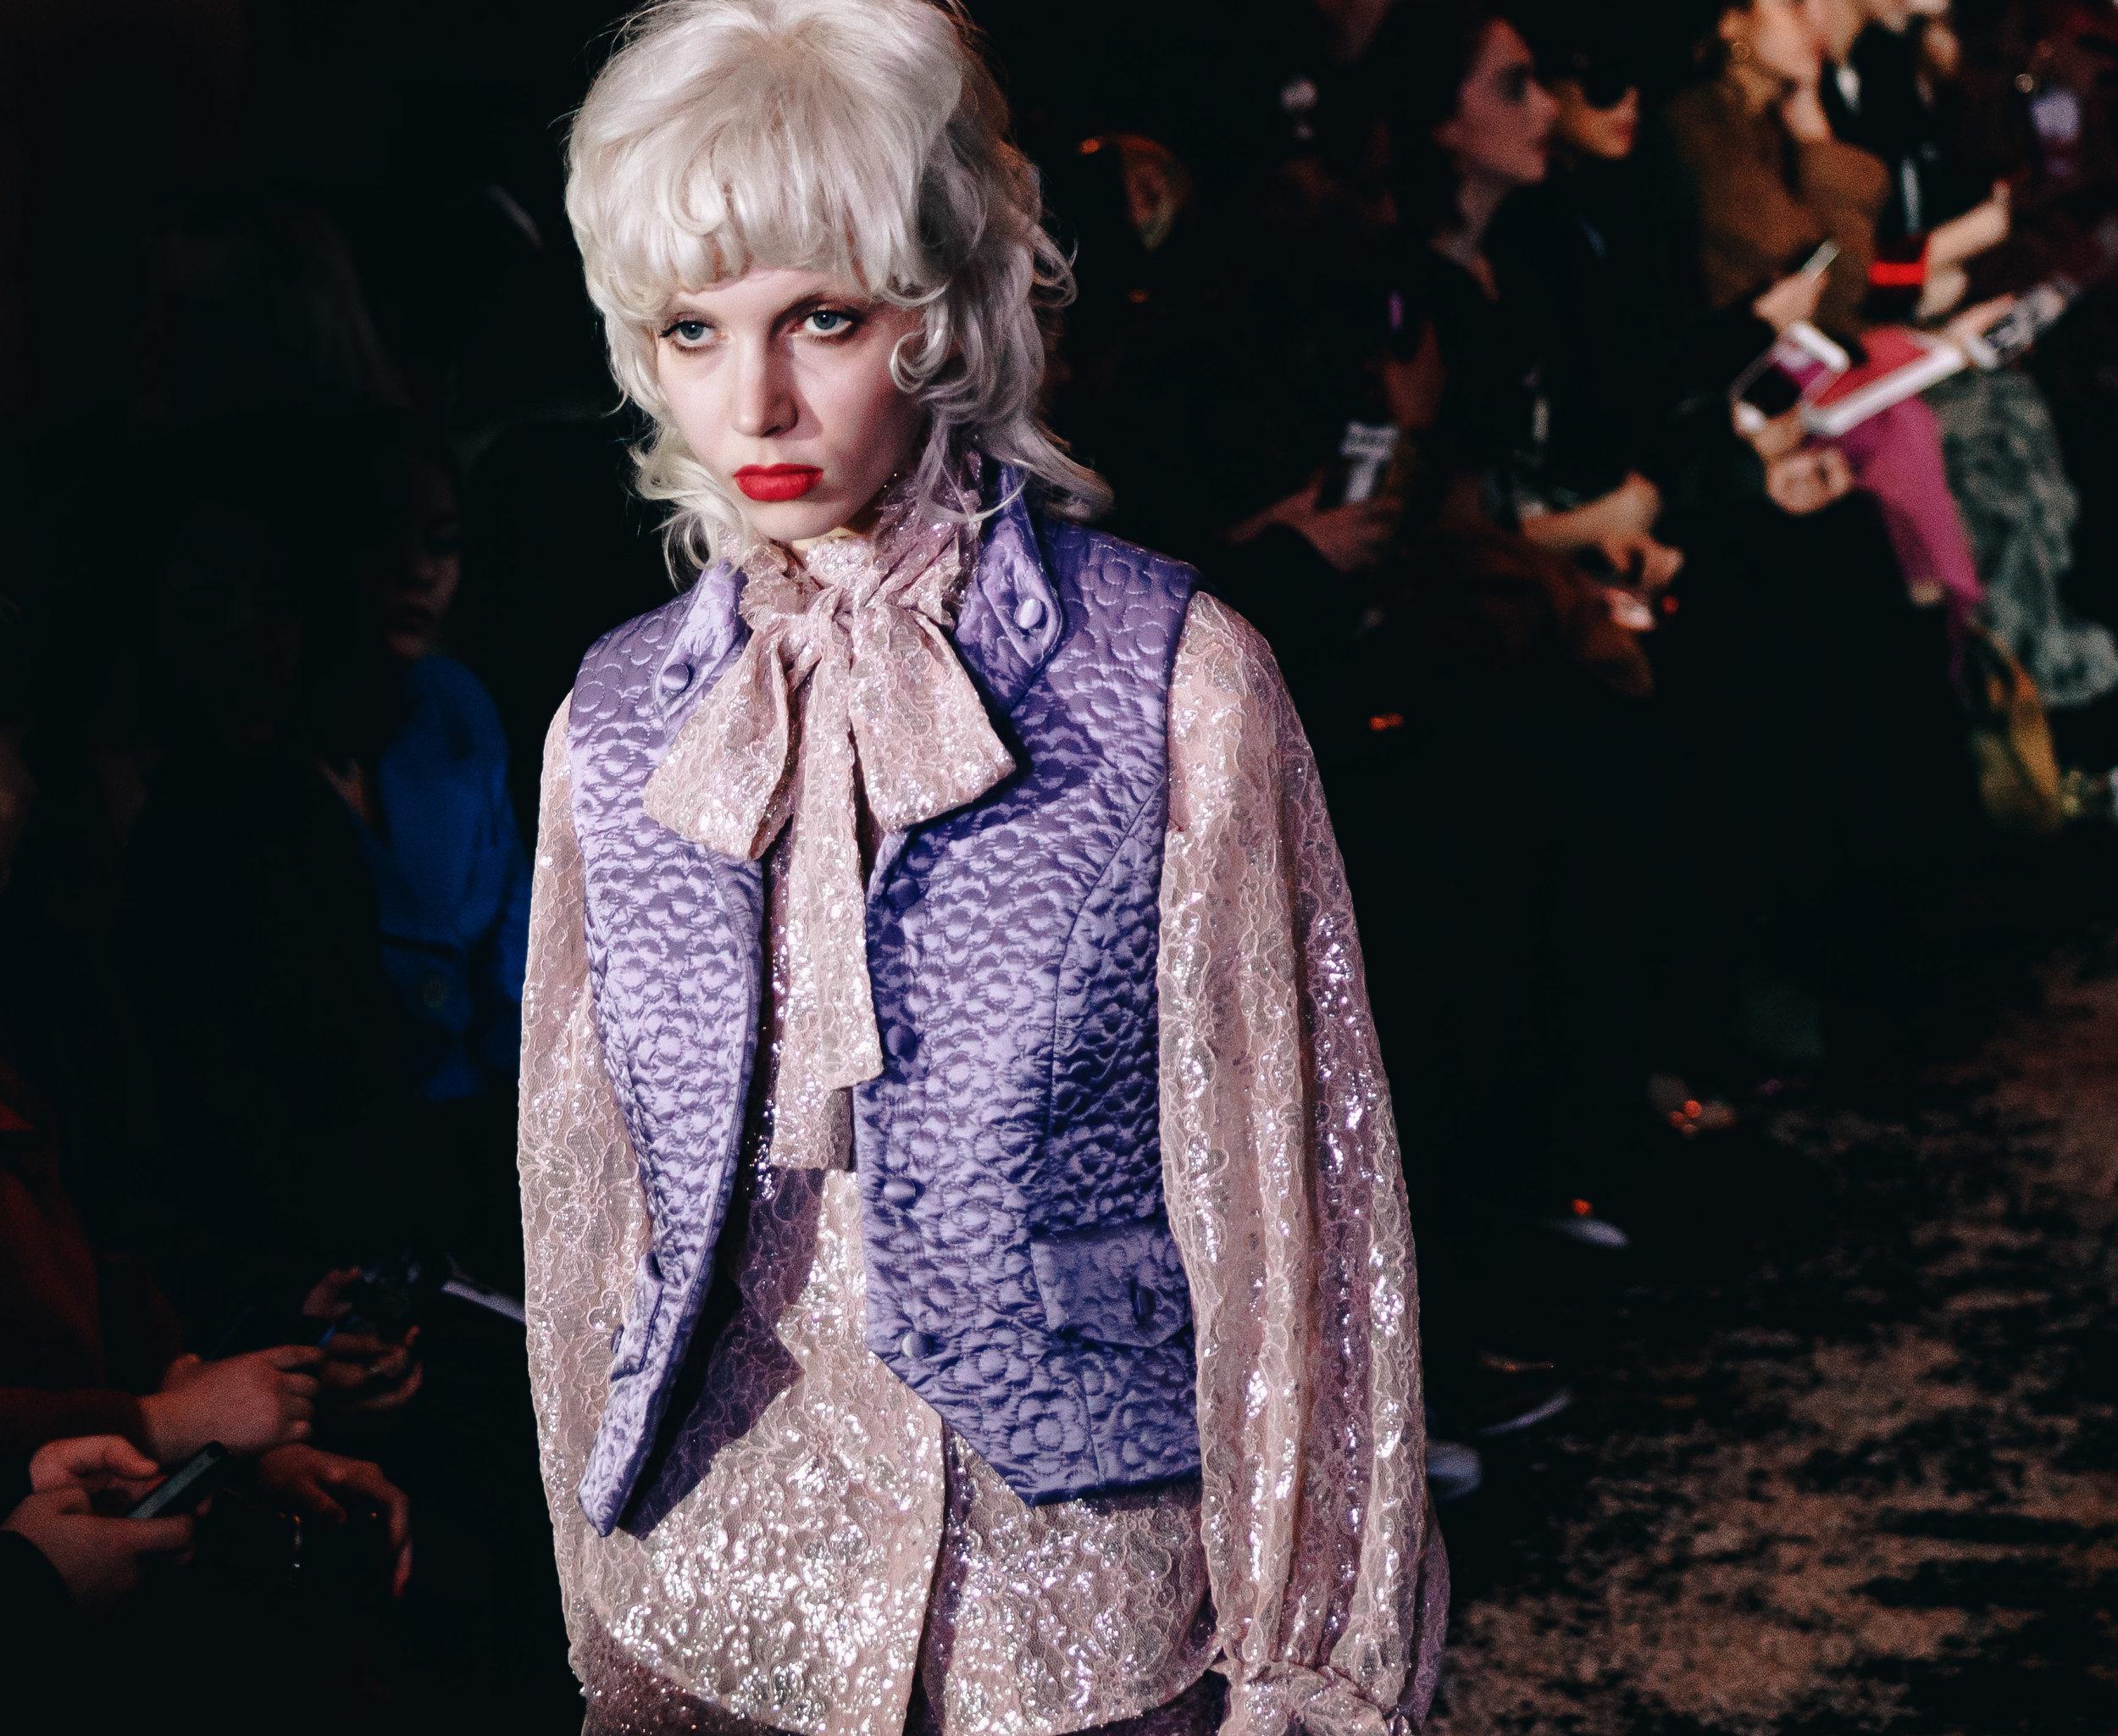 London fashion week Ryan Lo AW19 Adorngirl 10.jpg